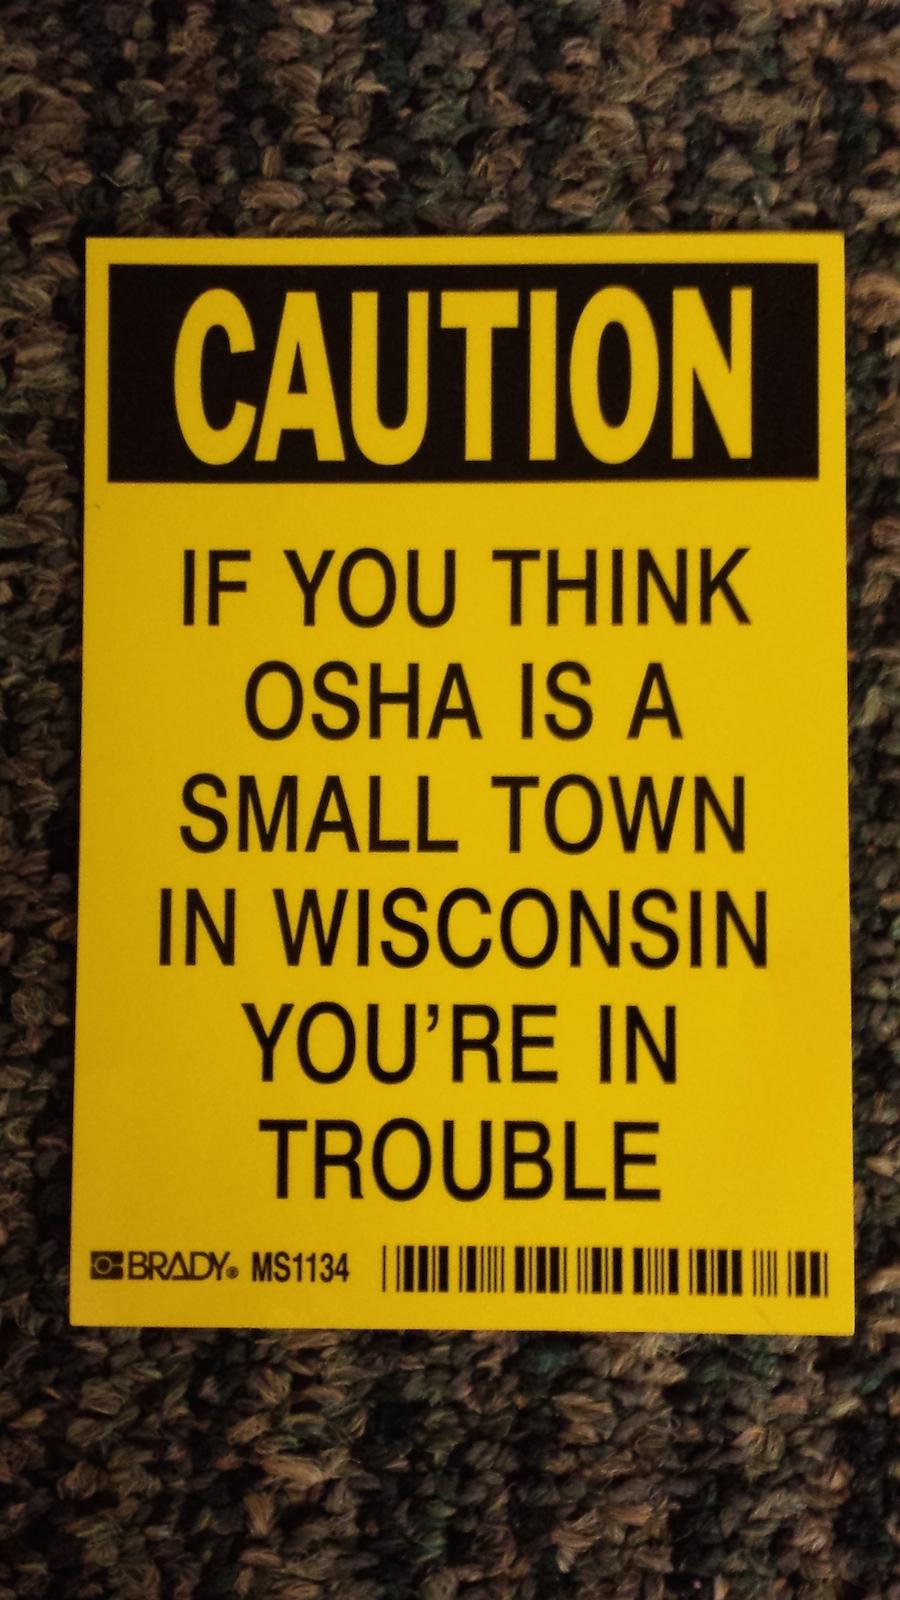 Minnesota Safety and Health Conference - Lisa